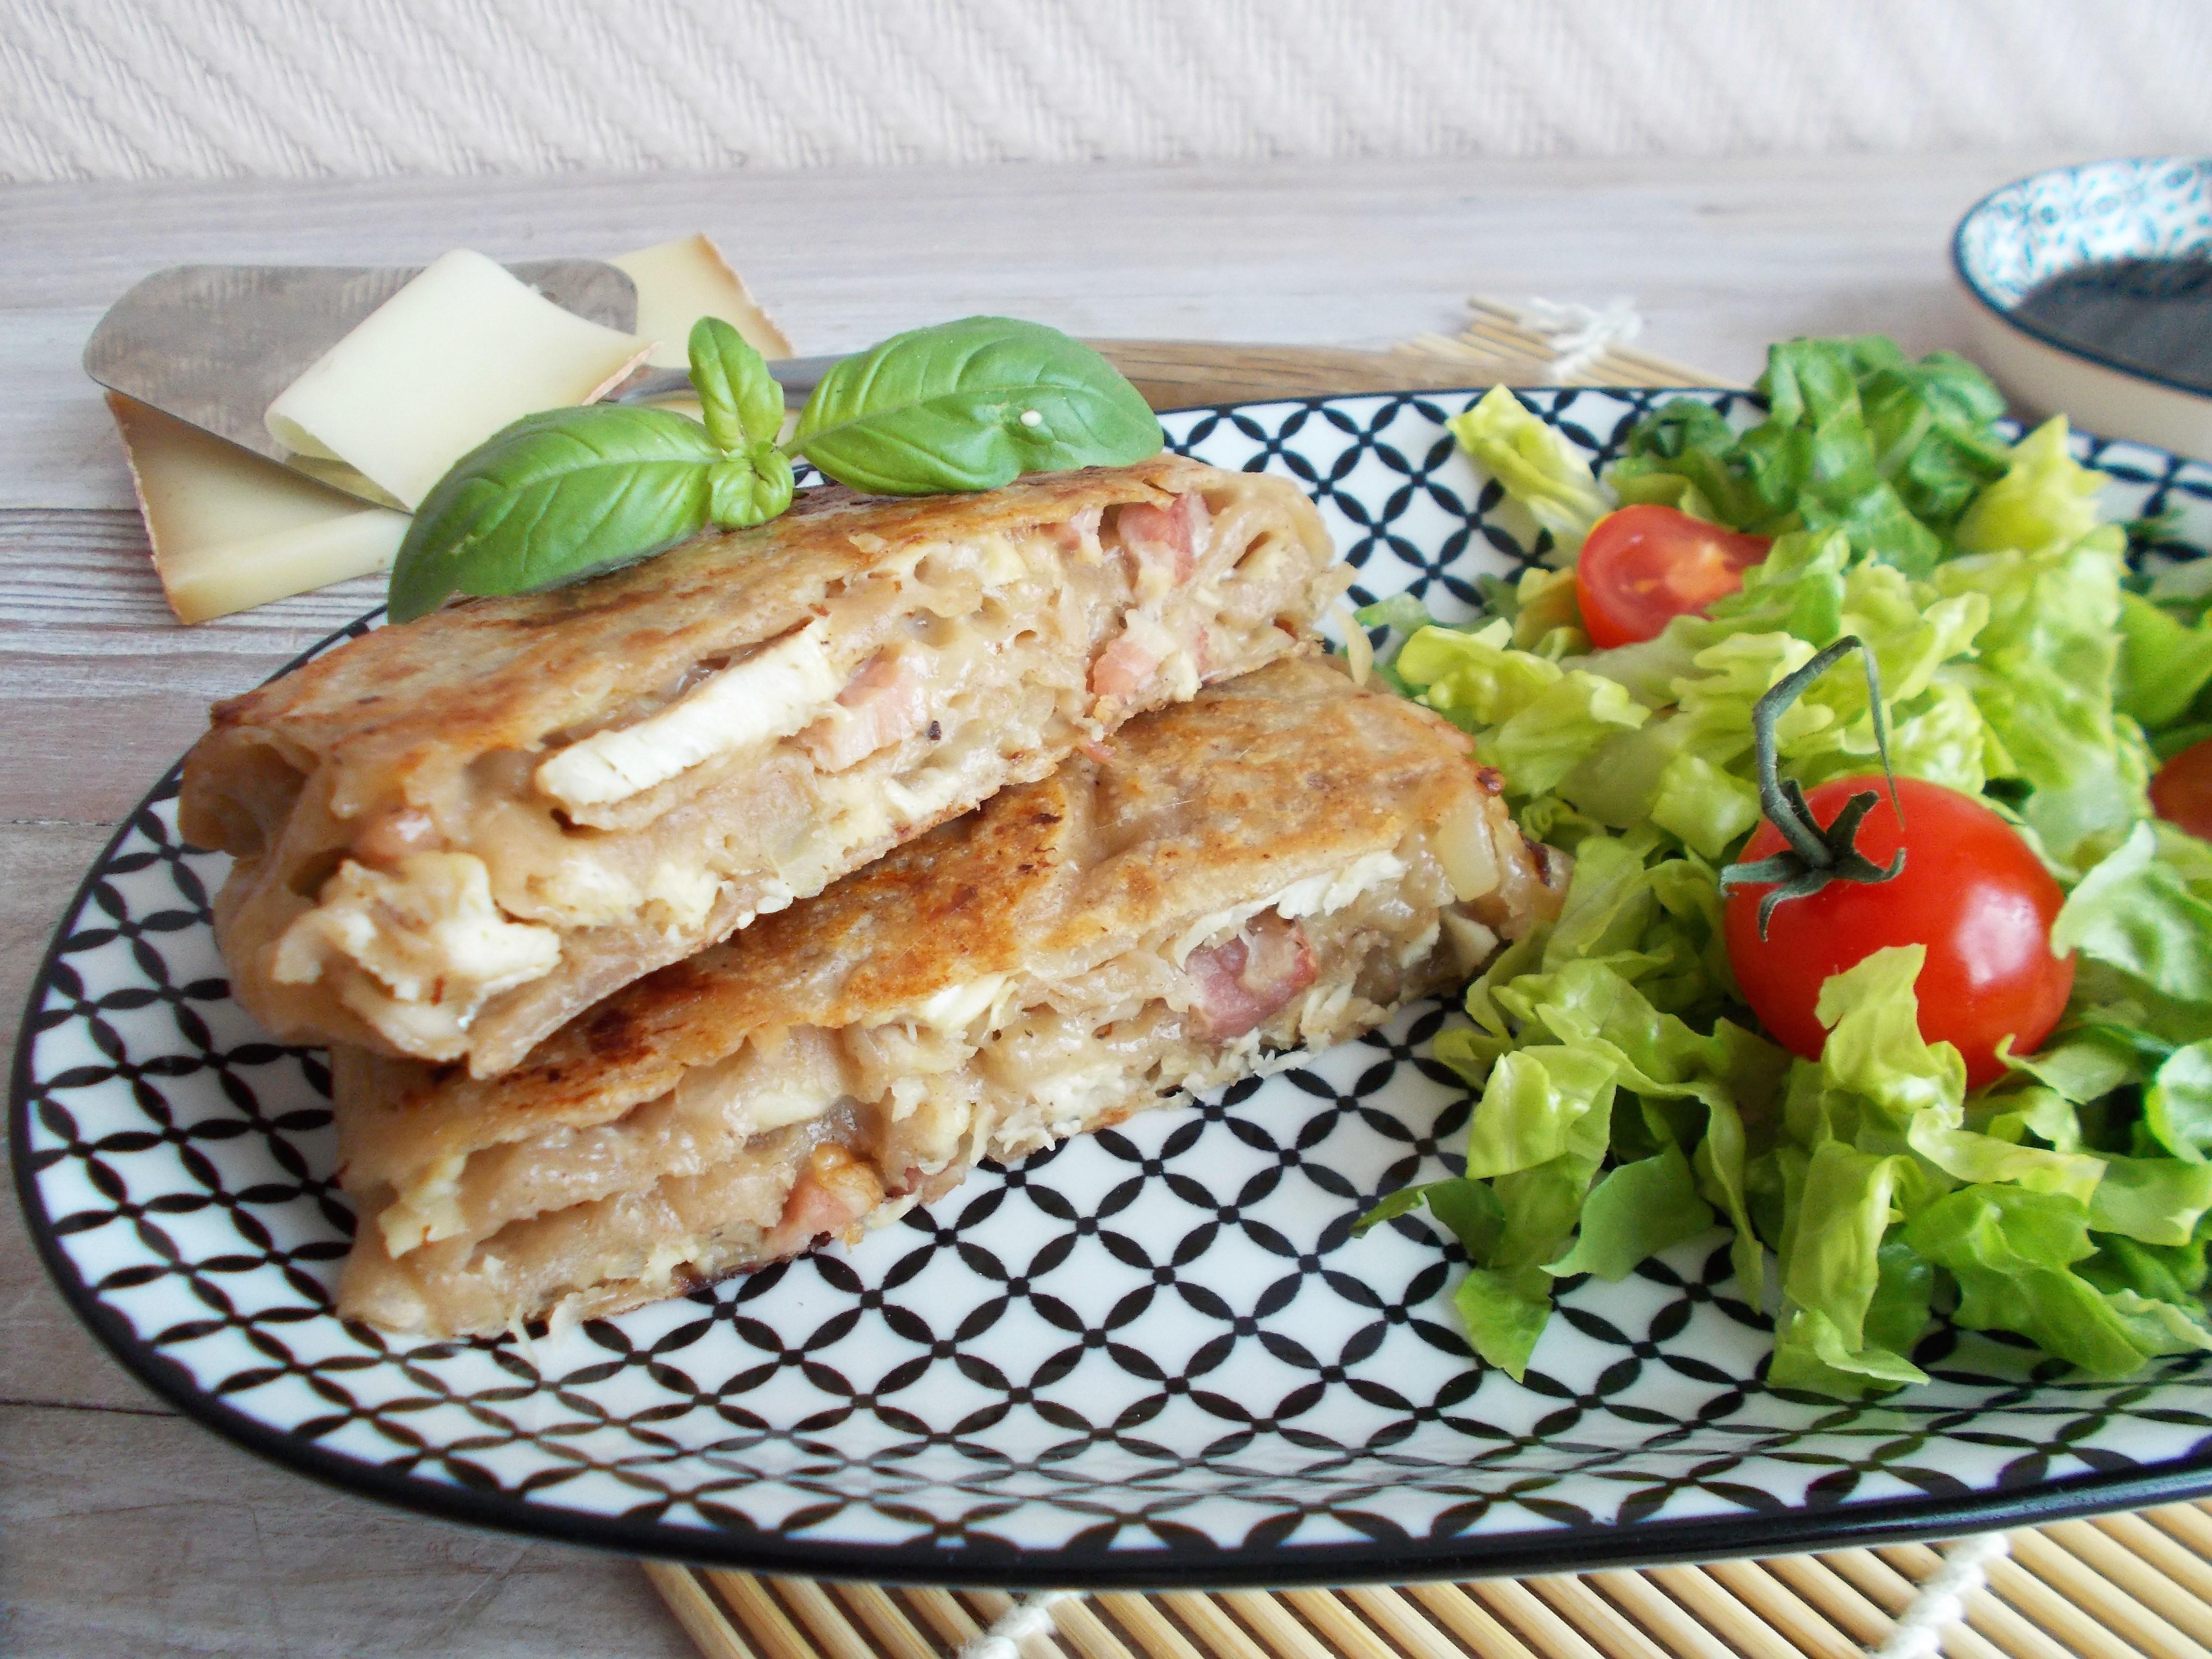 Galette chinoise au poulet rôti et comté (pancake sher ping)